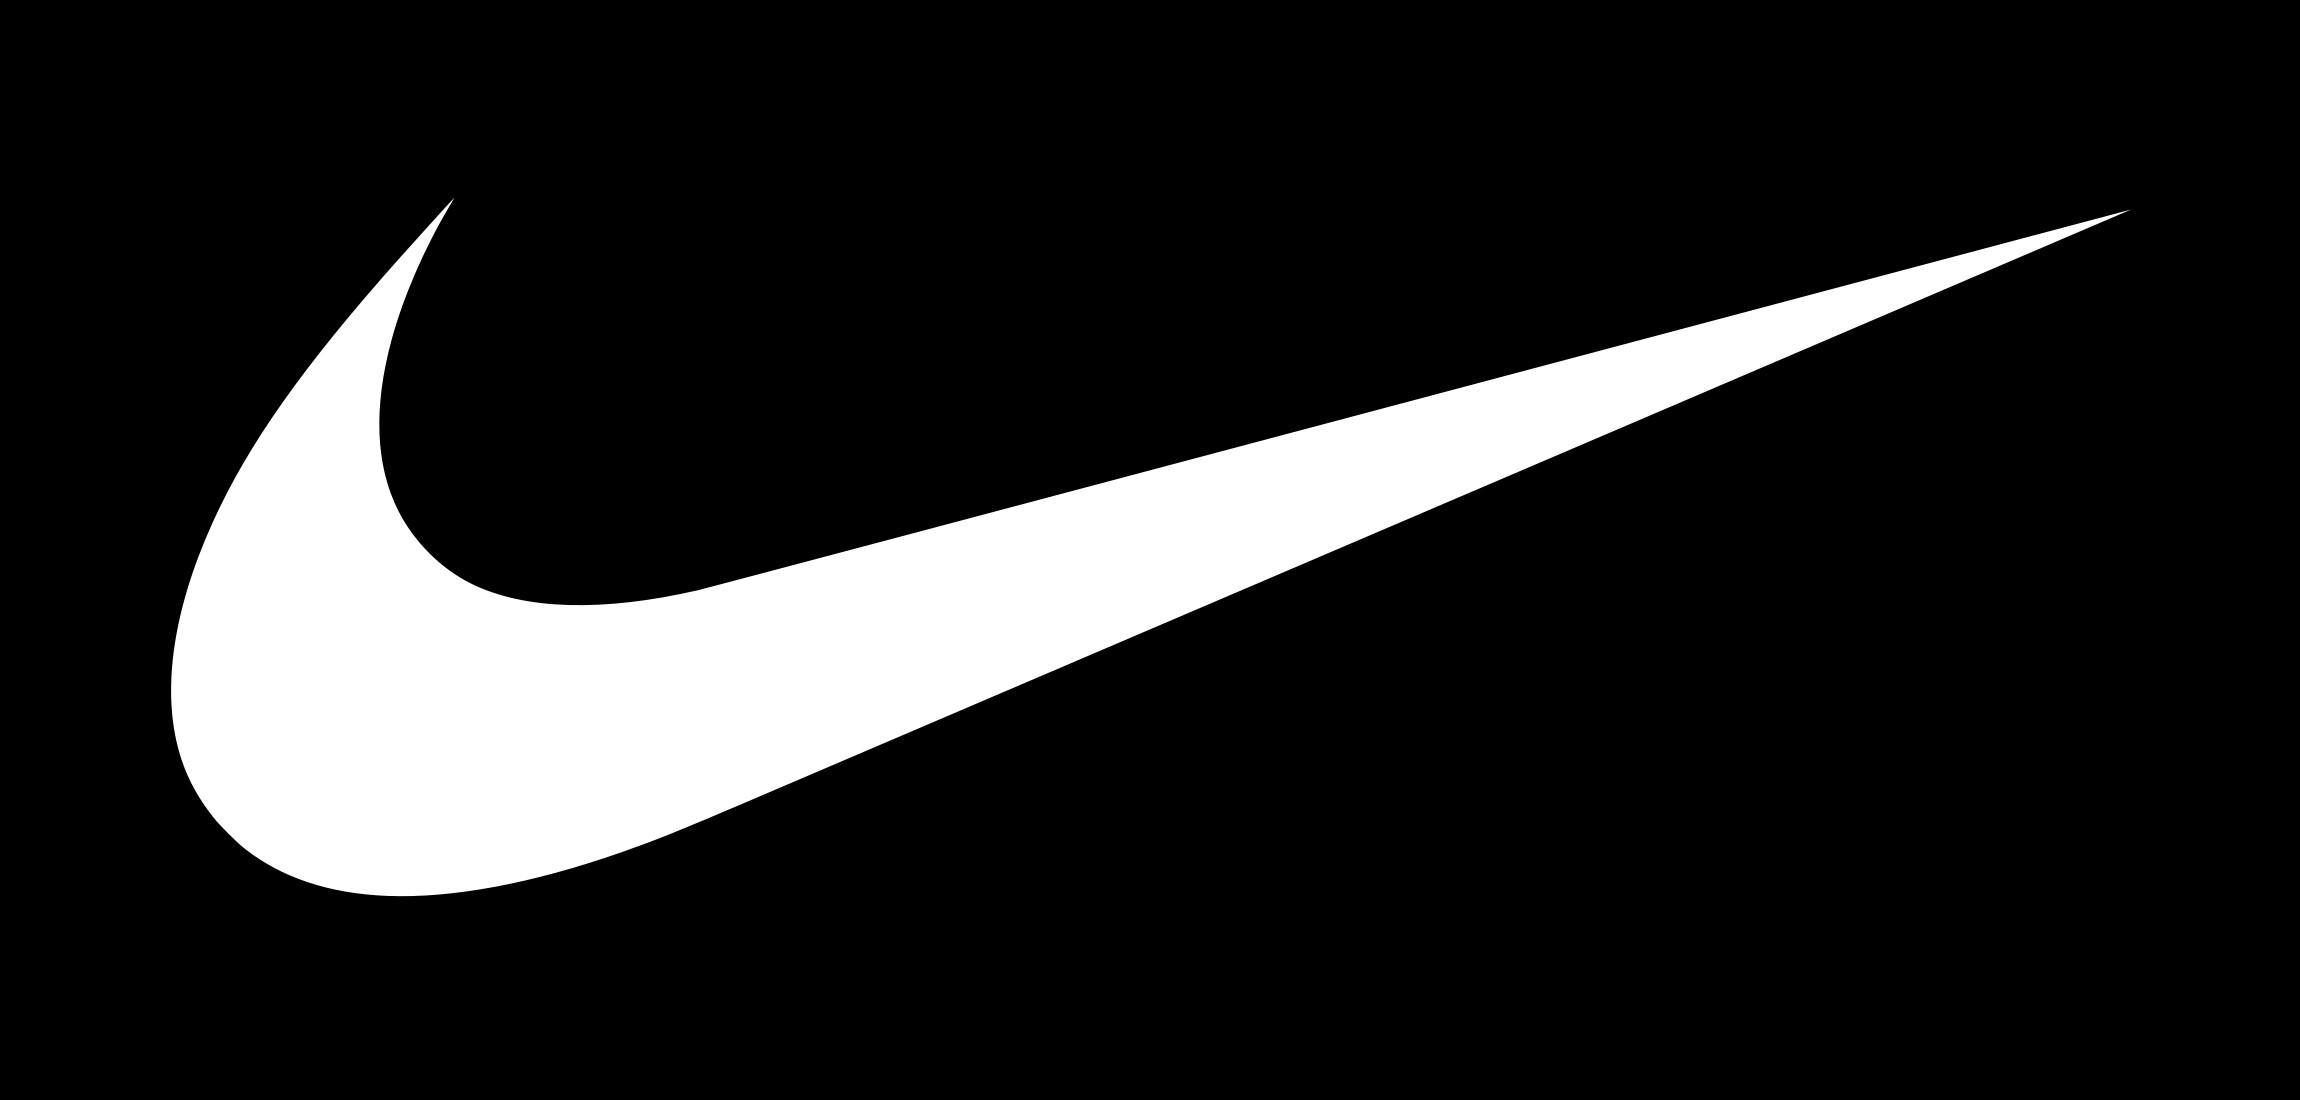 Nike Swoosh Wallpapers: Nike Swoosh Iphone Background Labzada Wallpaper